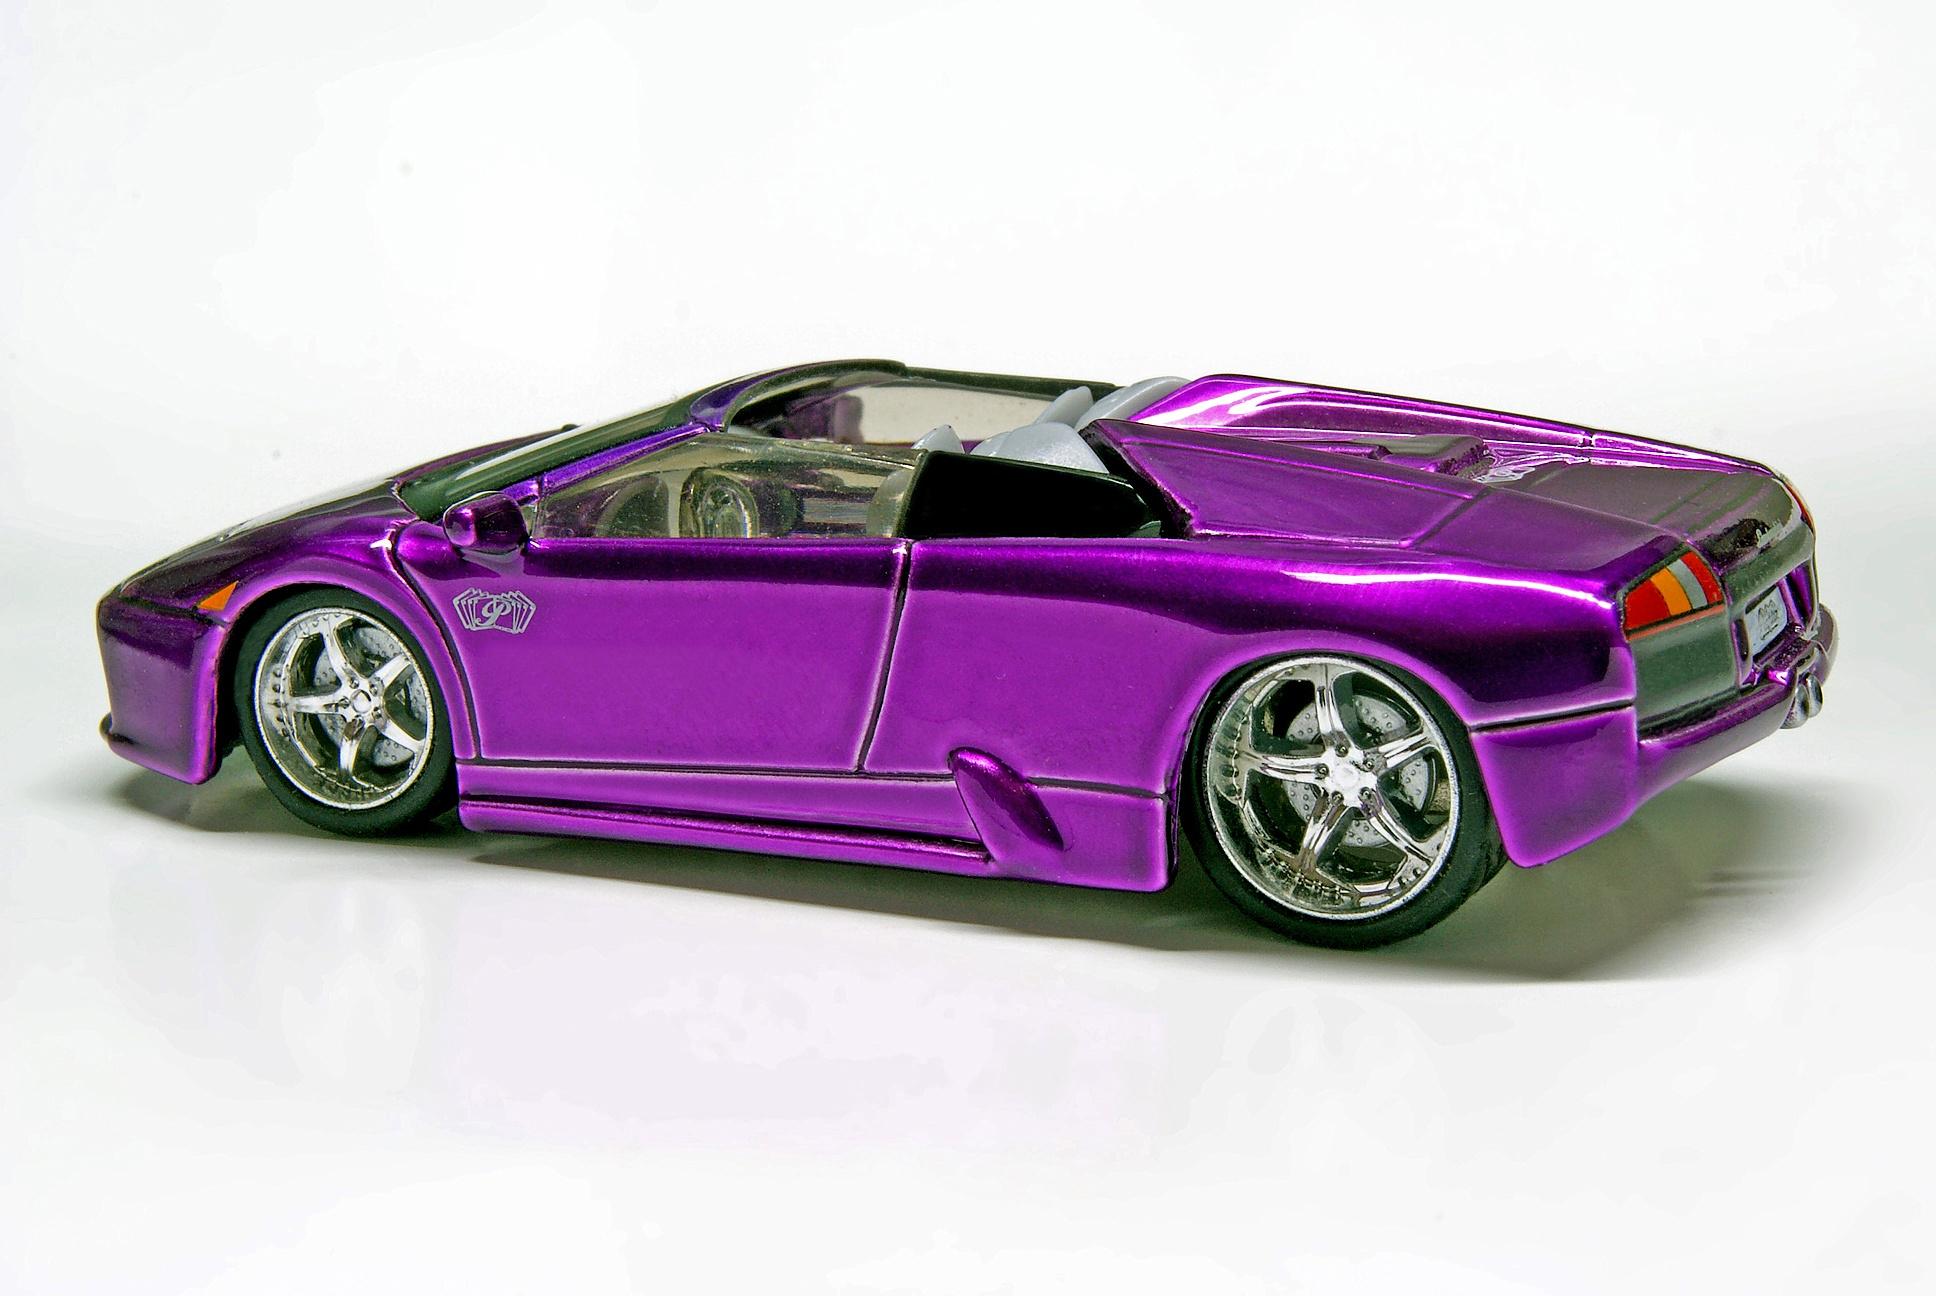 latest?cb=20100726103102 Surprising Lamborghini Gallardo Hot Wheels Wiki Cars Trend